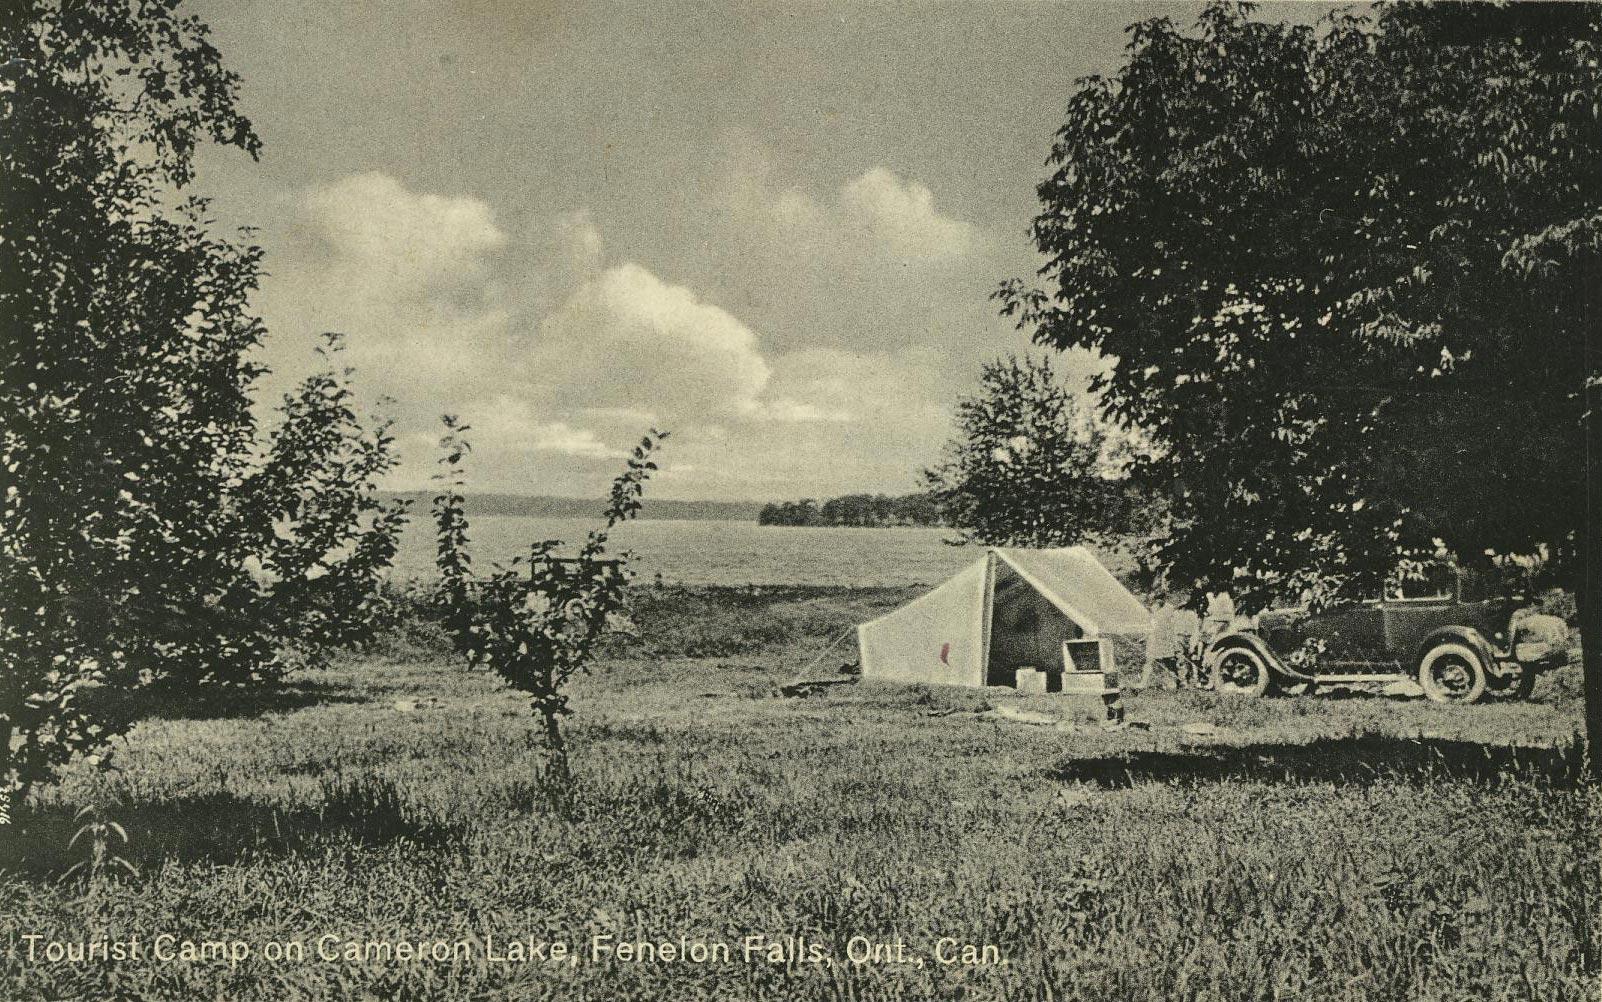 Tourist Camp at Fenelon Falls